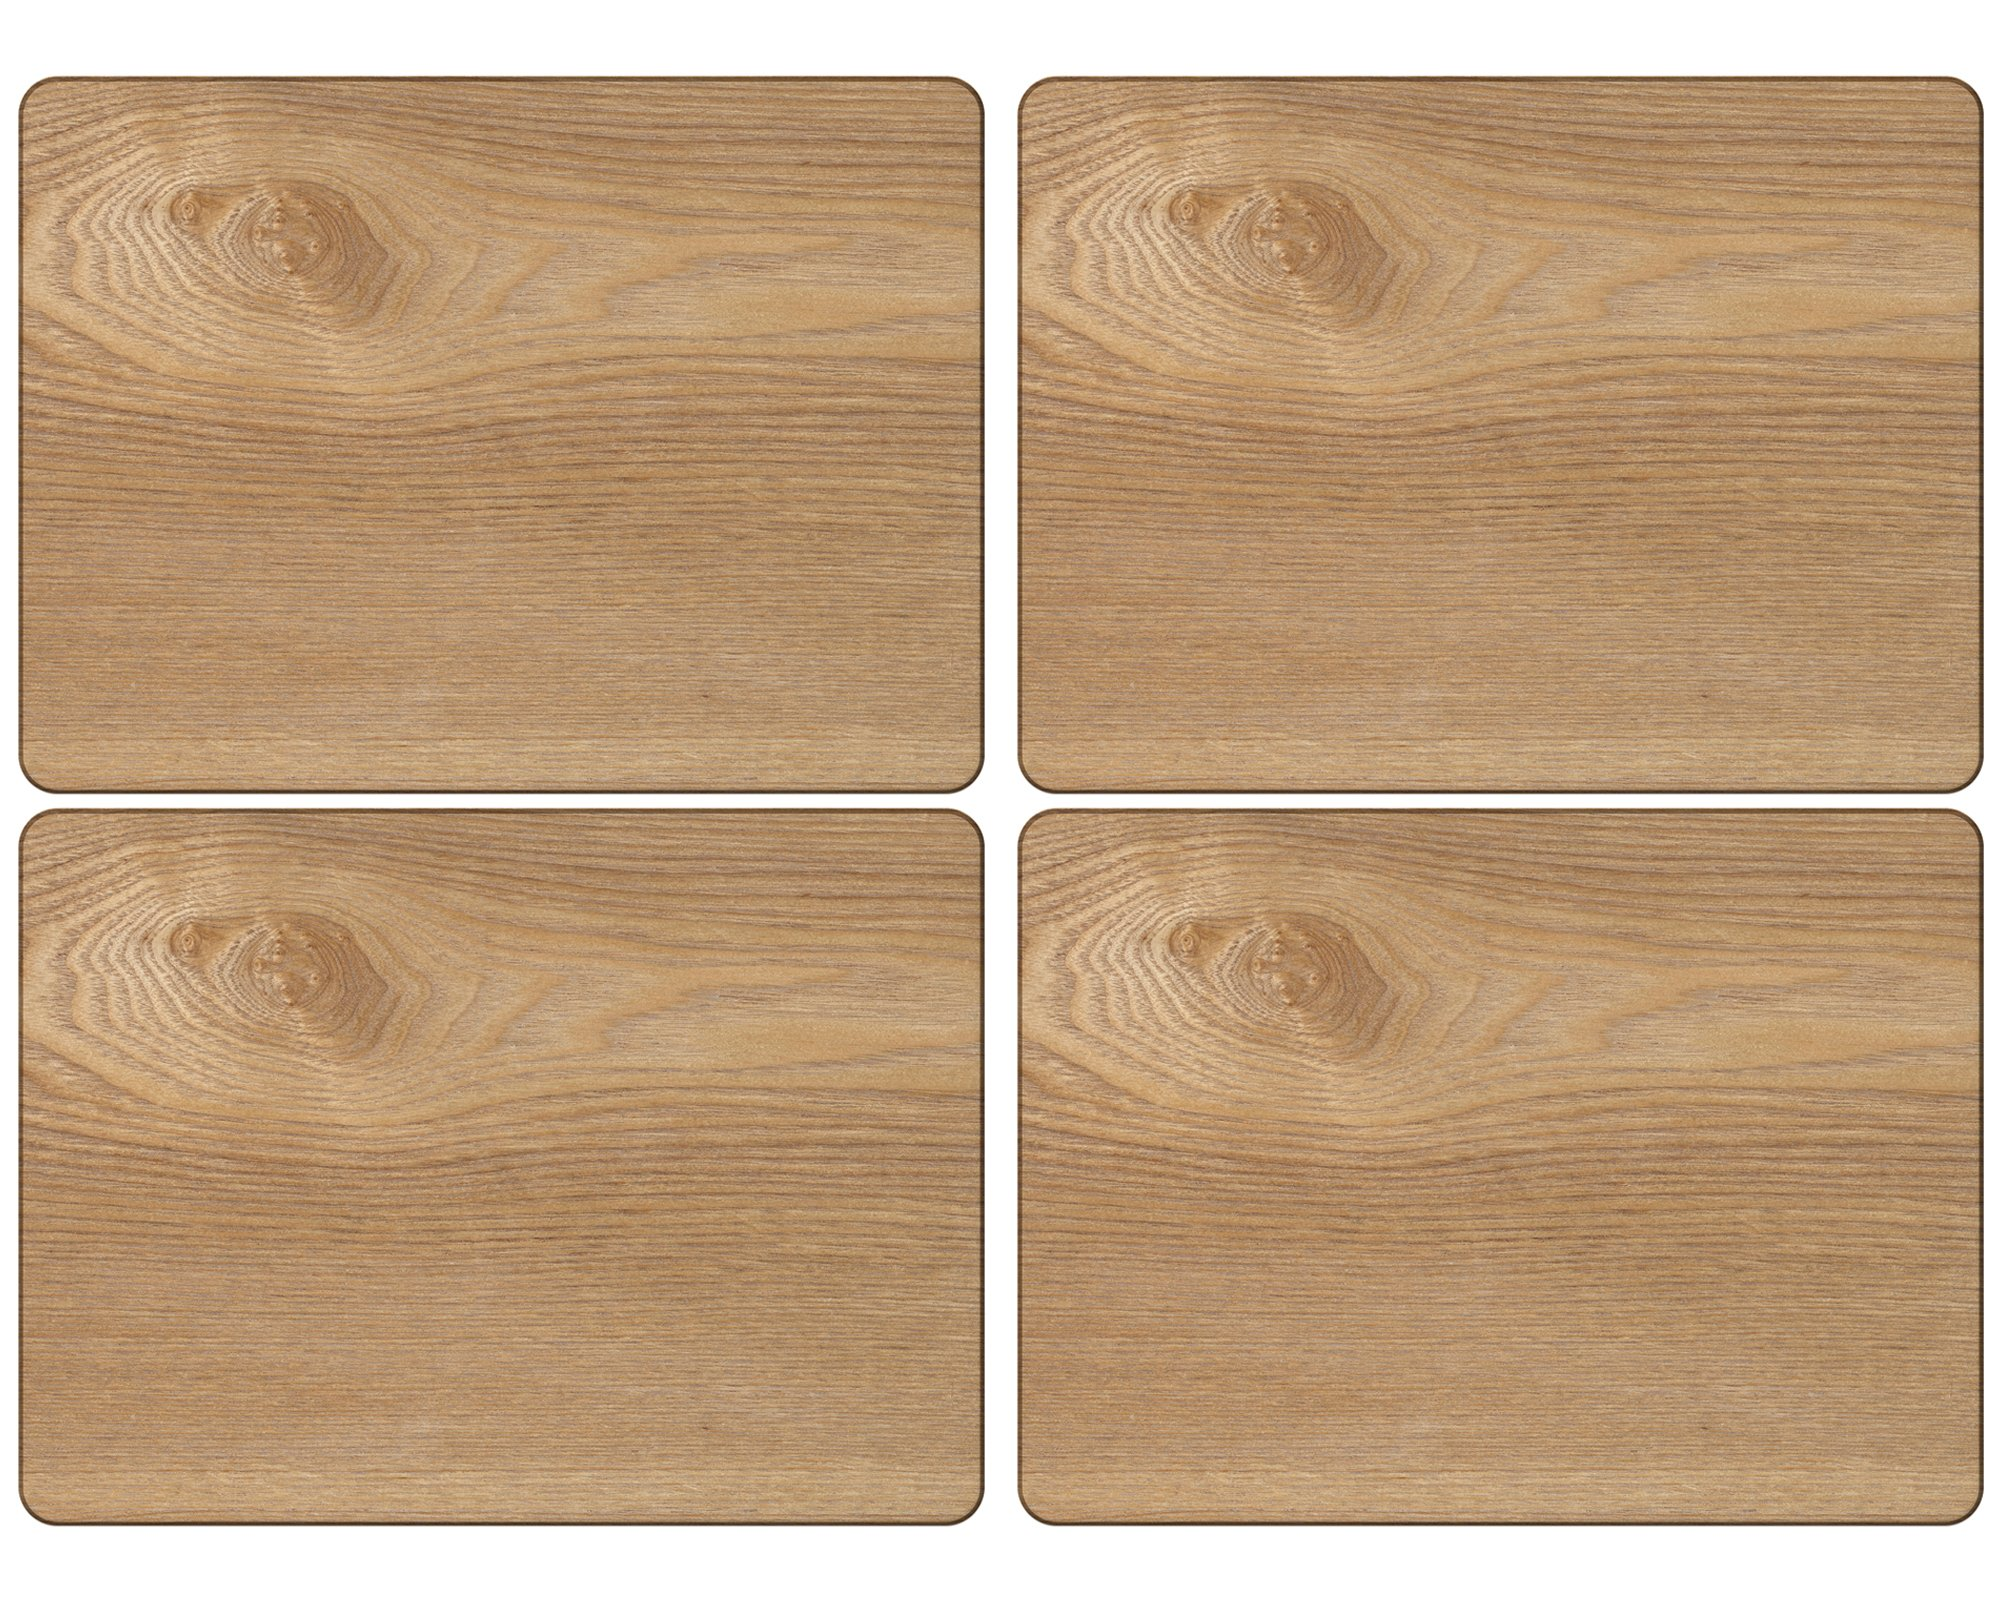 Set Of 4 Oak Veneer Placemats By Creative Tops, 29.5 x 21cm (11½'' x 8¼'')